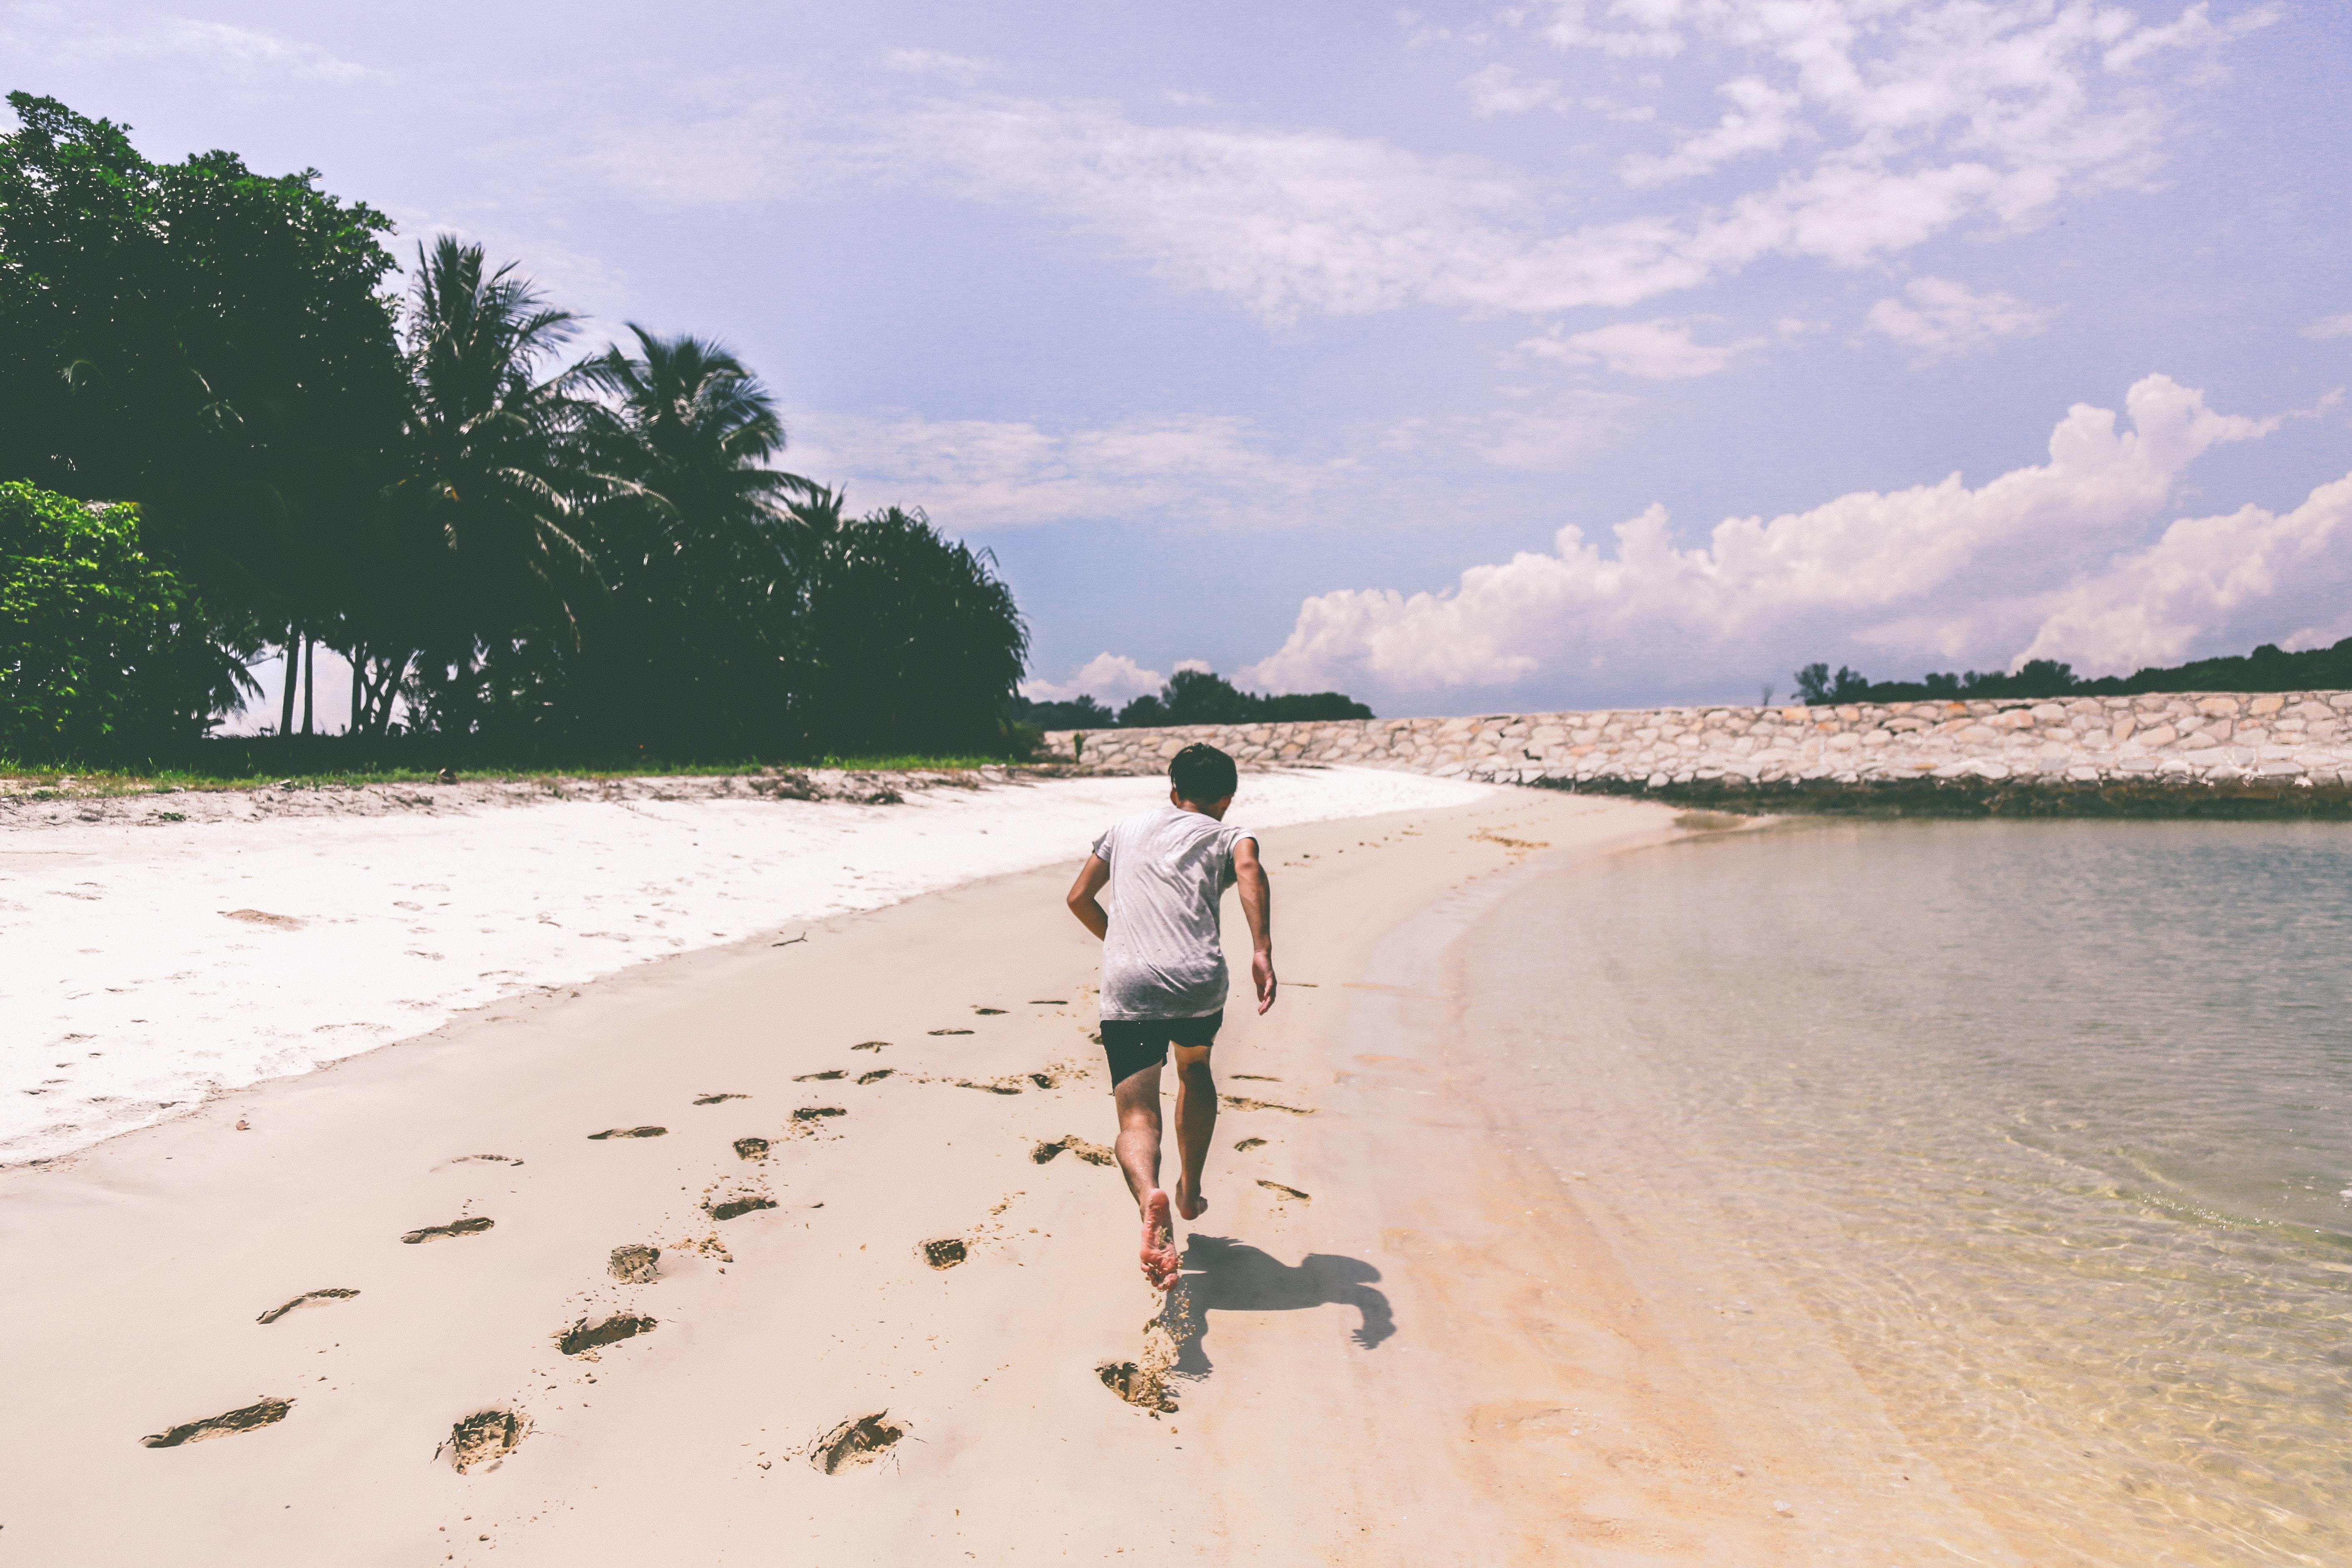 running man - photo by Alex wong